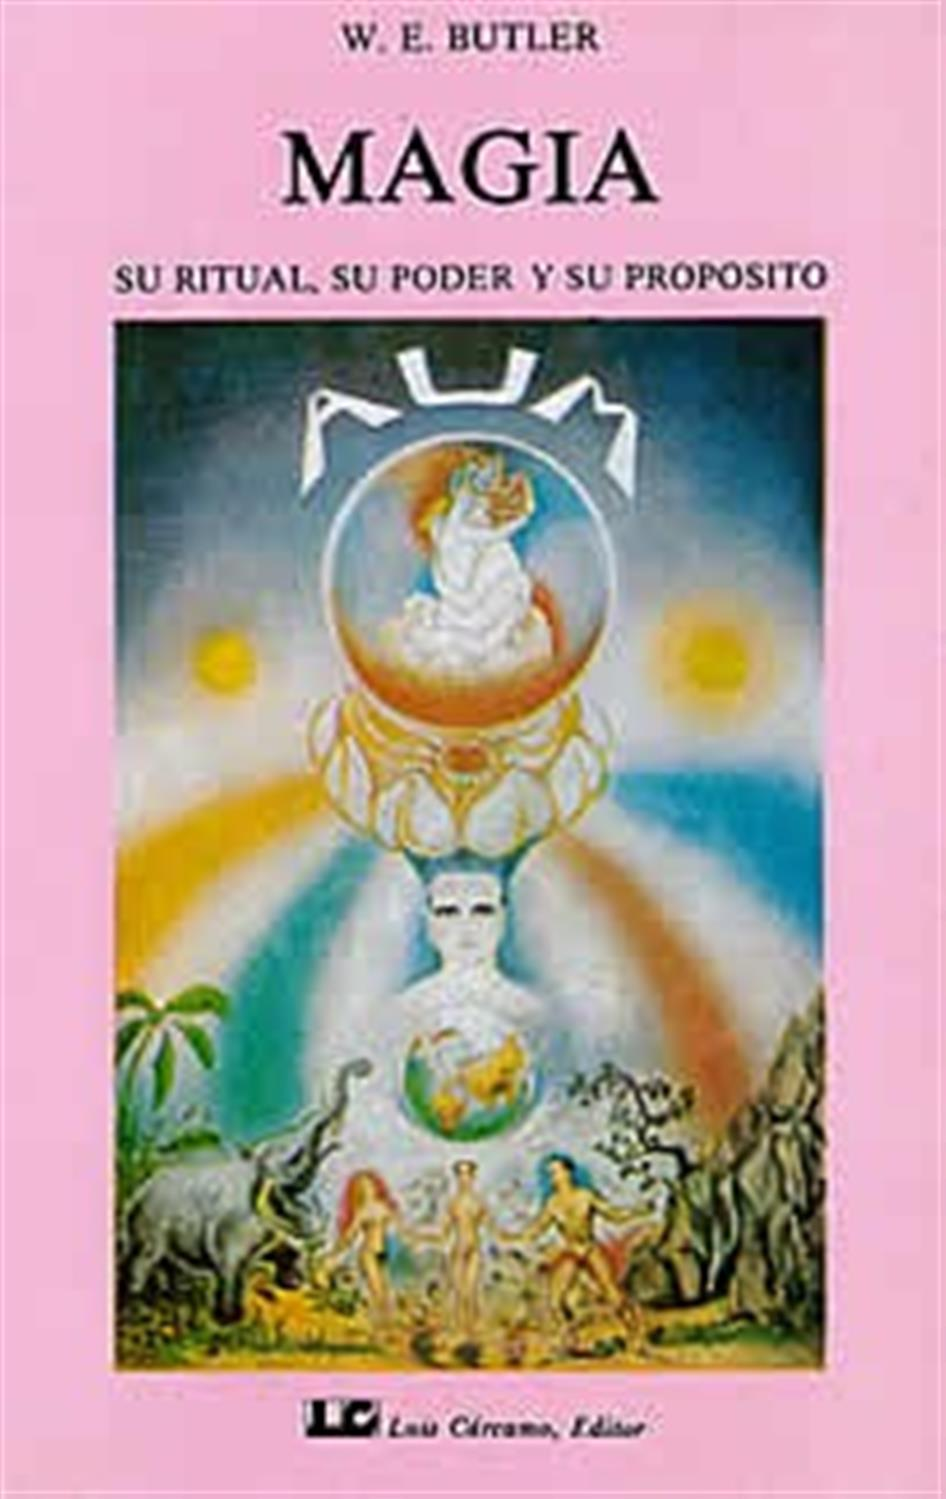 Magia-Su ritual, su poder y su propósito